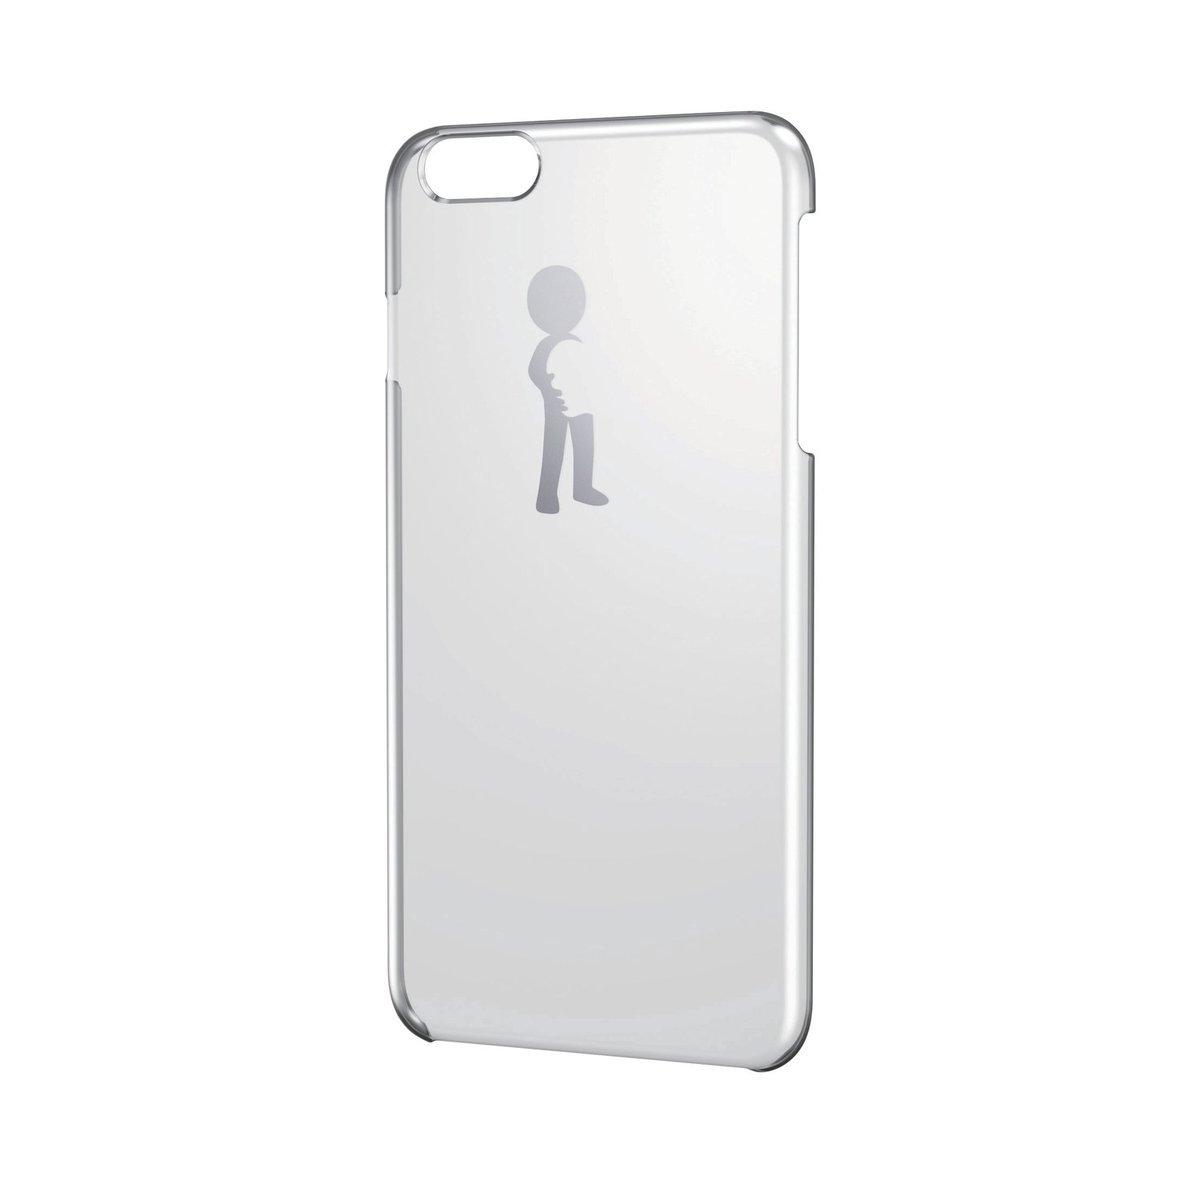 iPhone 6/6S Plus銀色圖案硬殼(擁抱)